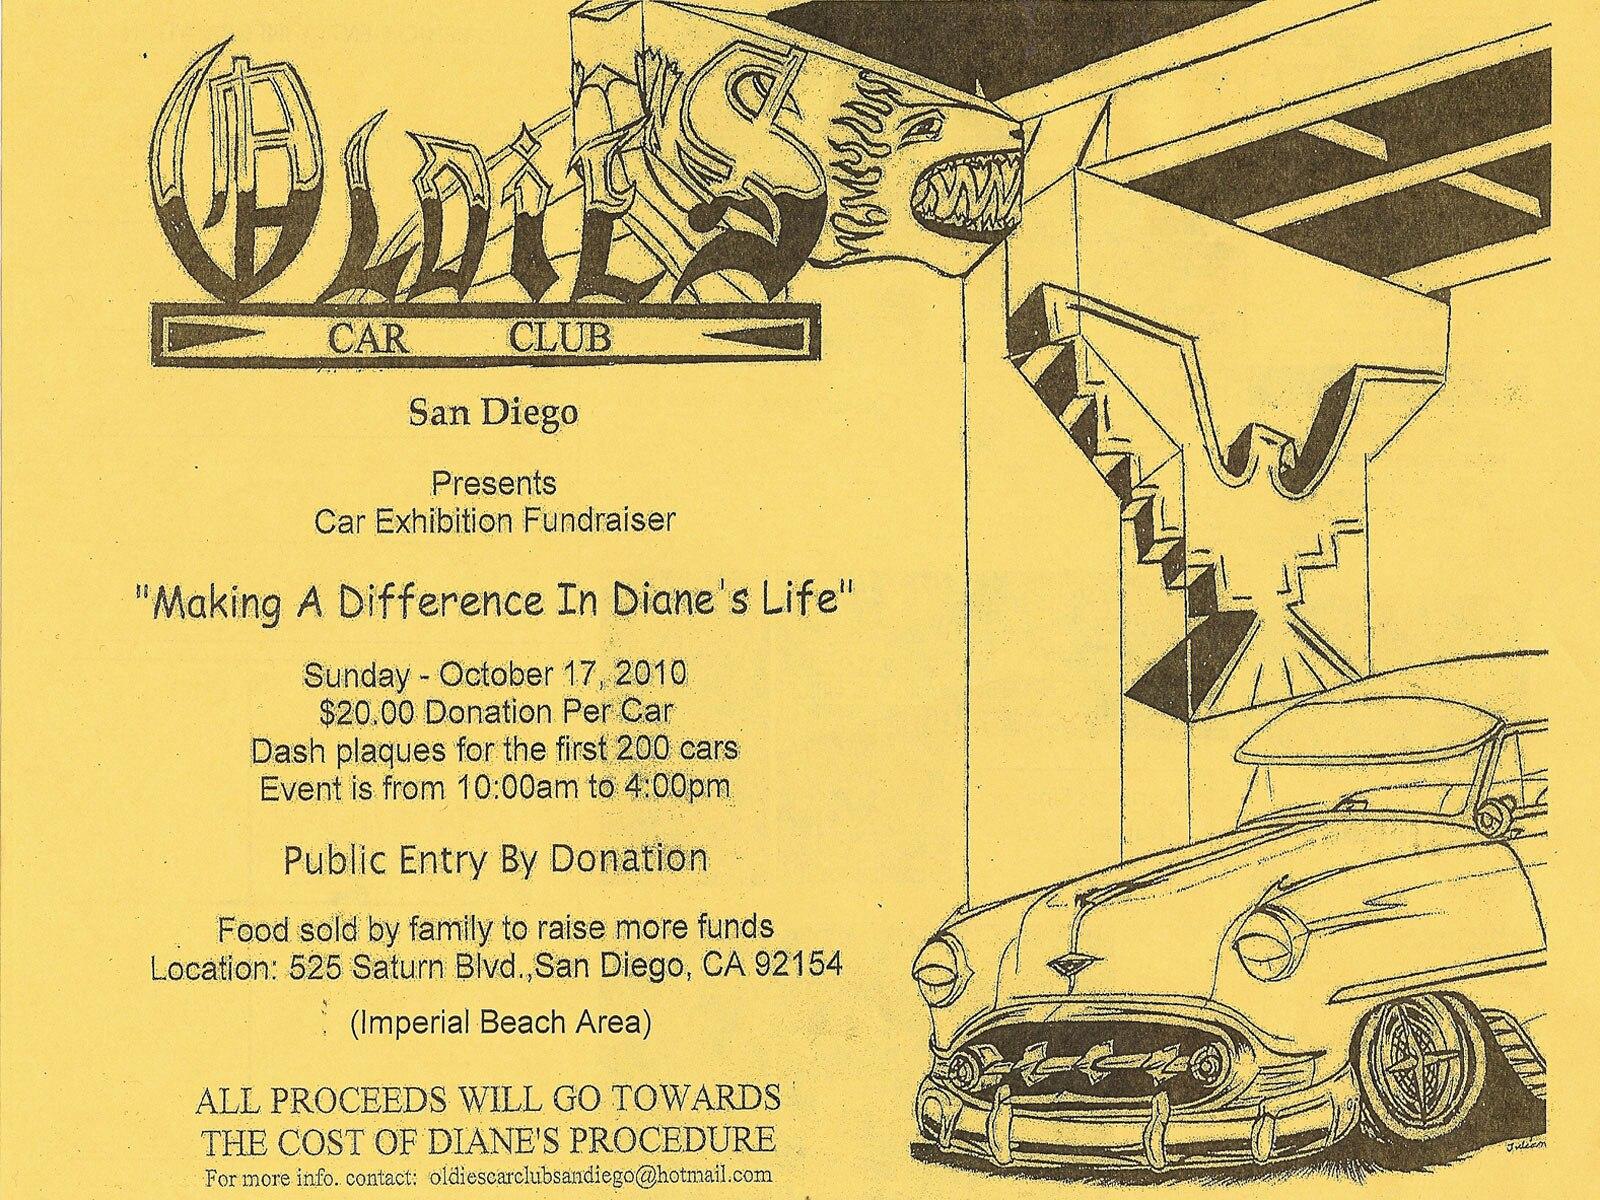 lrmp_1009_01_o-oldies_car_club_making_a_difference_in_dianes_life-oldies_car_club2